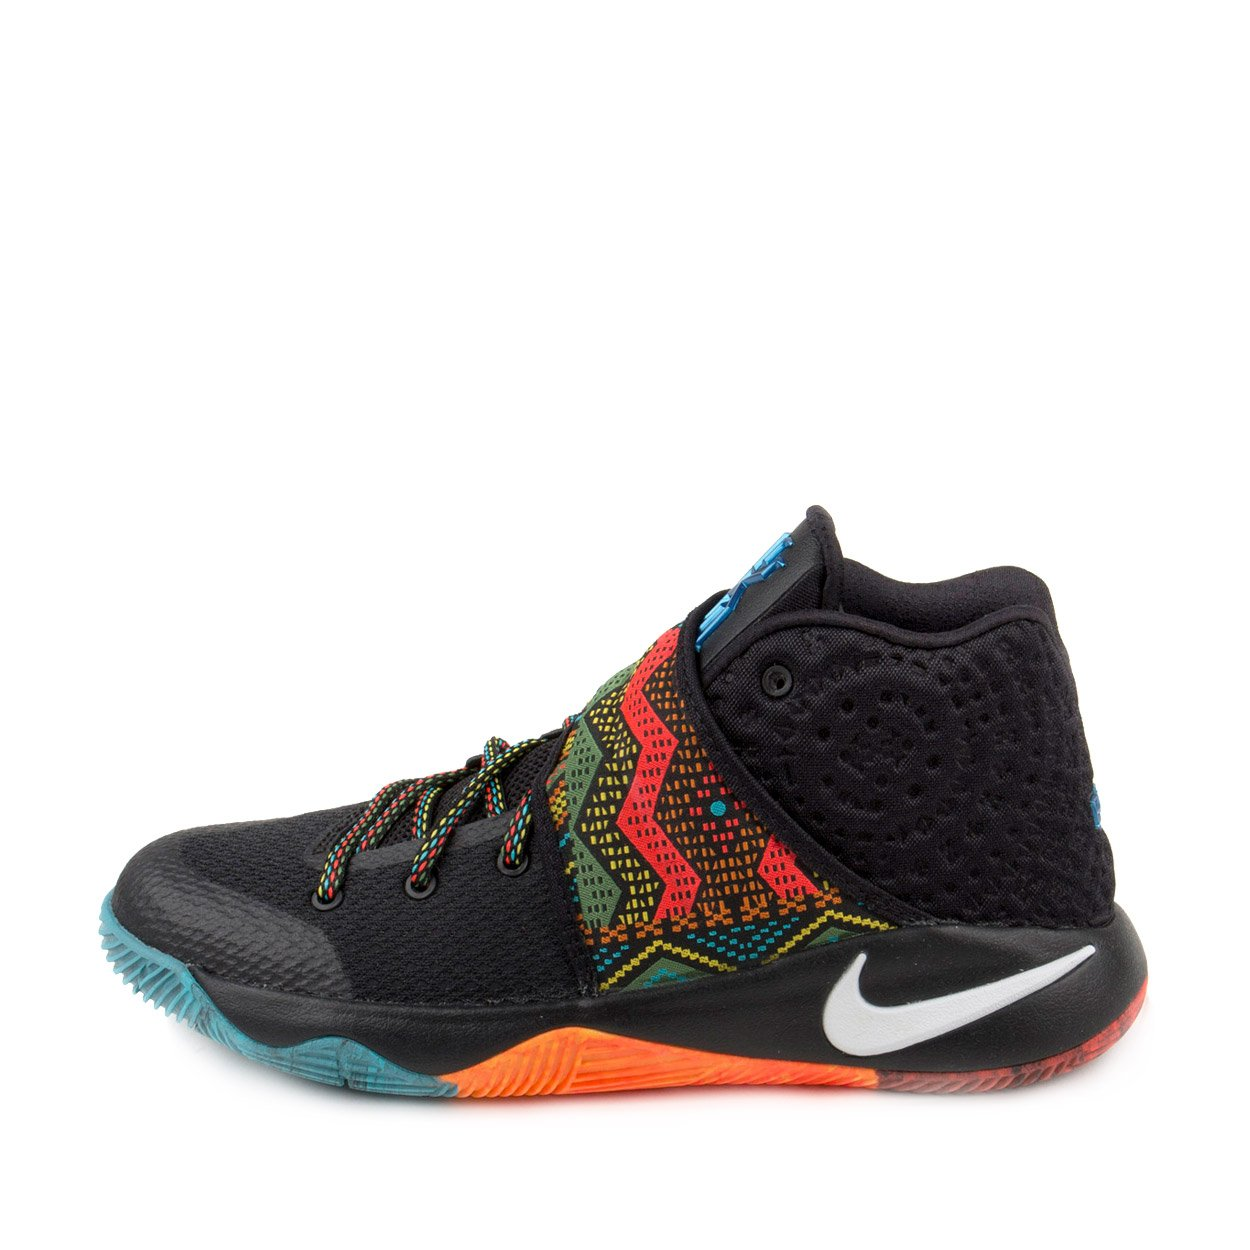 Galleon Nike Kyrie 2 Gs Bhm Black Multi Color Multi